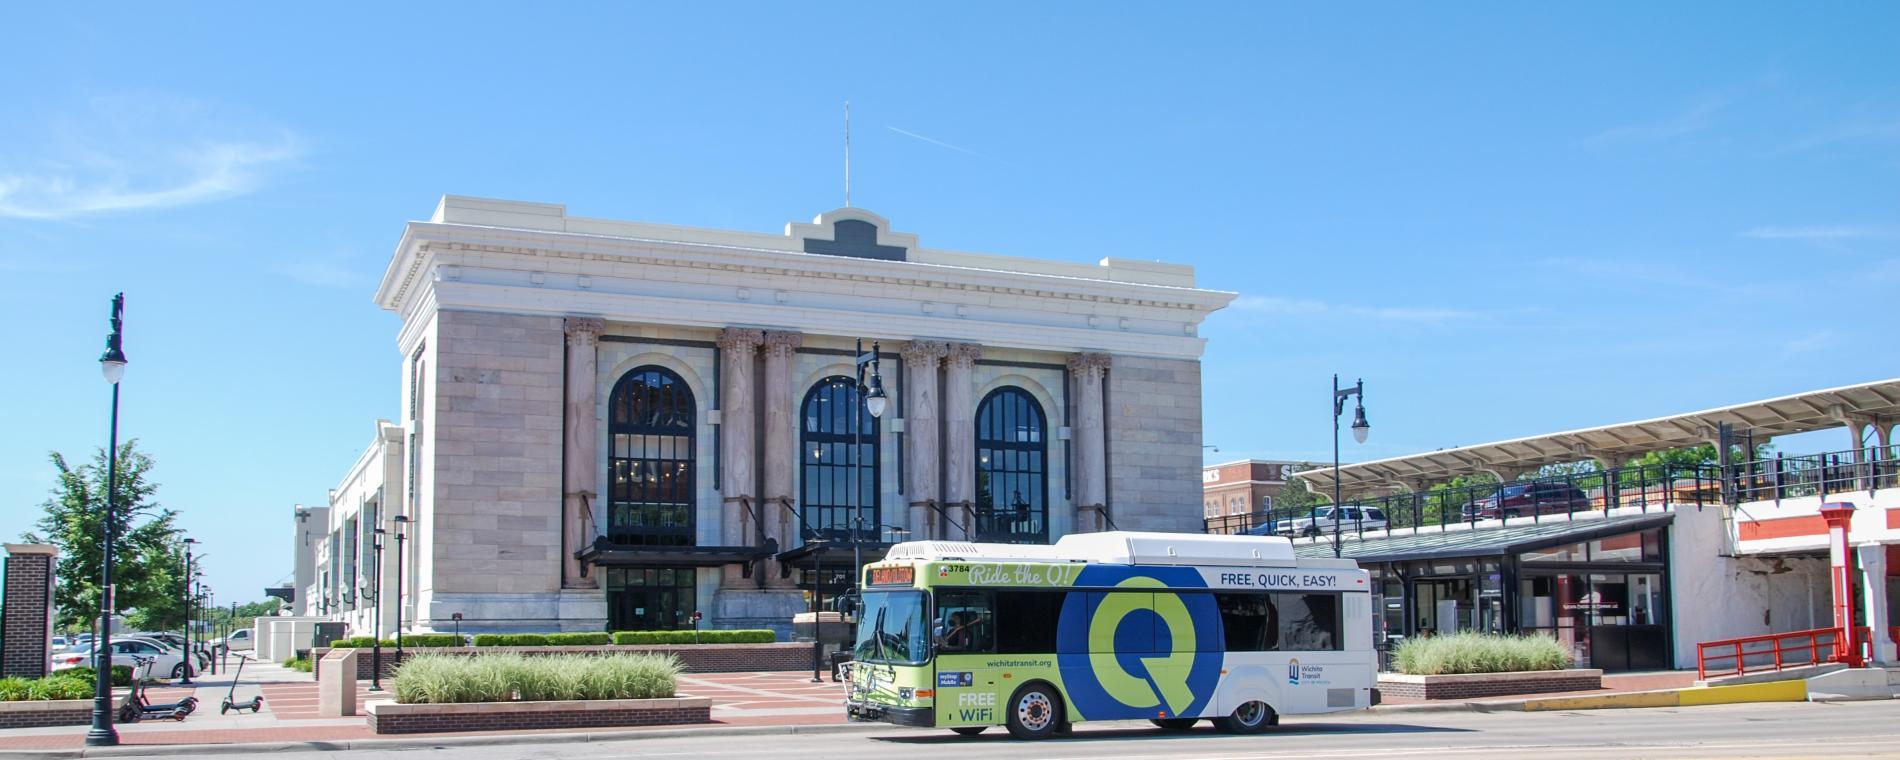 Q-line at Union Station